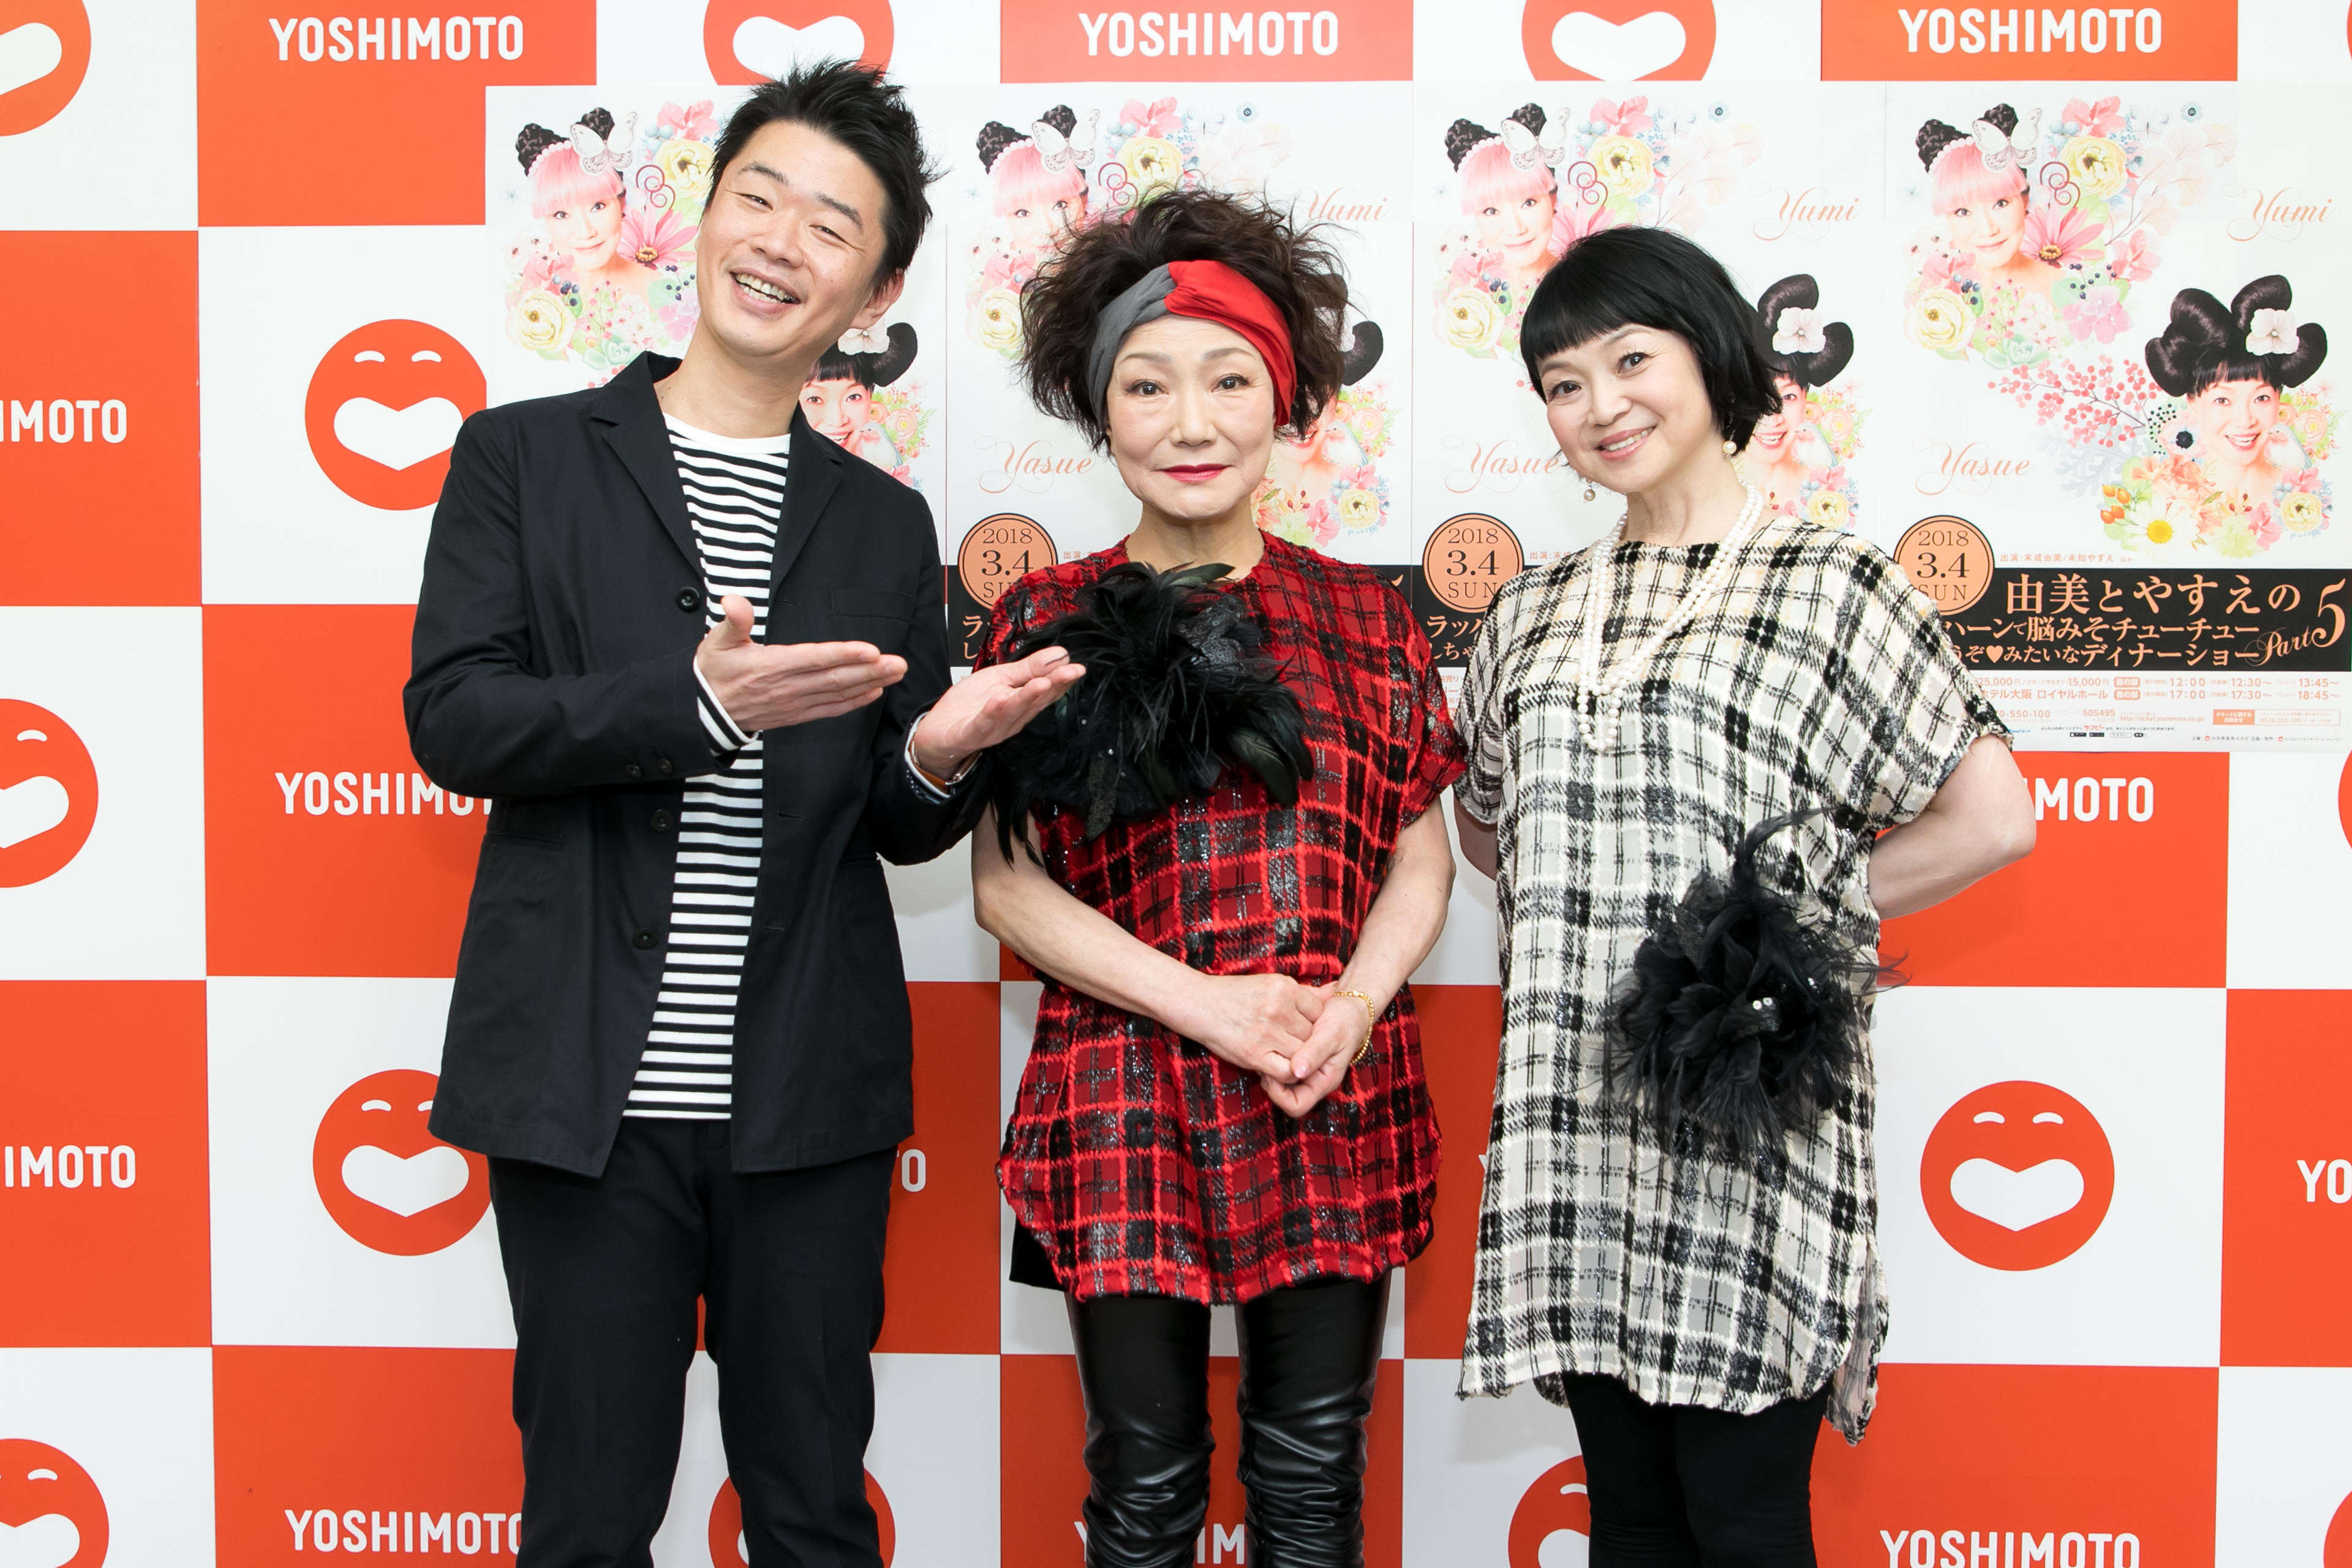 http://news.yoshimoto.co.jp/20171219143558-02799e08763b1ece4b7ff23d27fce85fa312708d.jpg